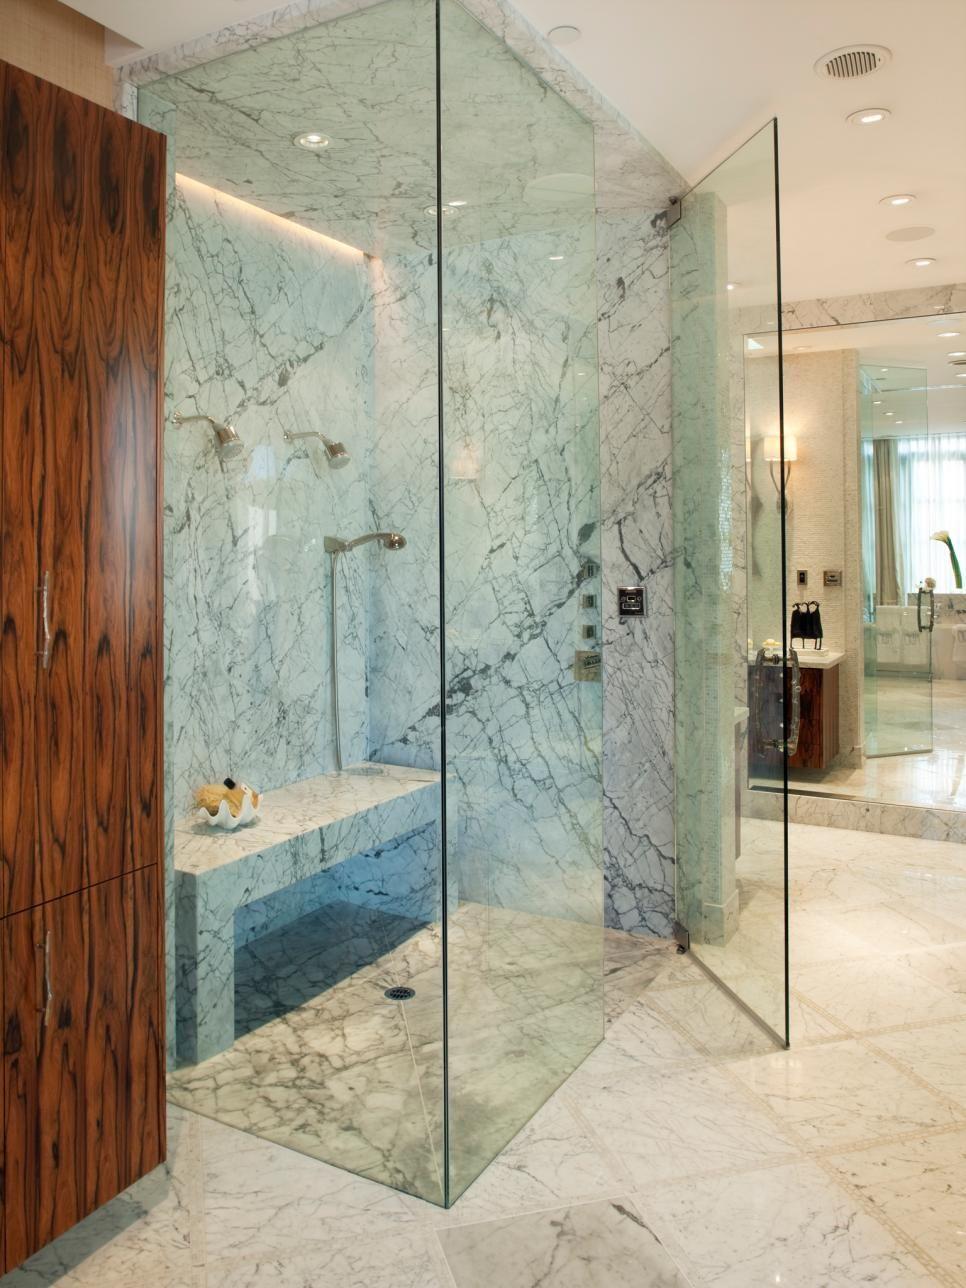 15 Dreamy Spa-Inspired Bathrooms | Steam showers, Bathing beauties ...